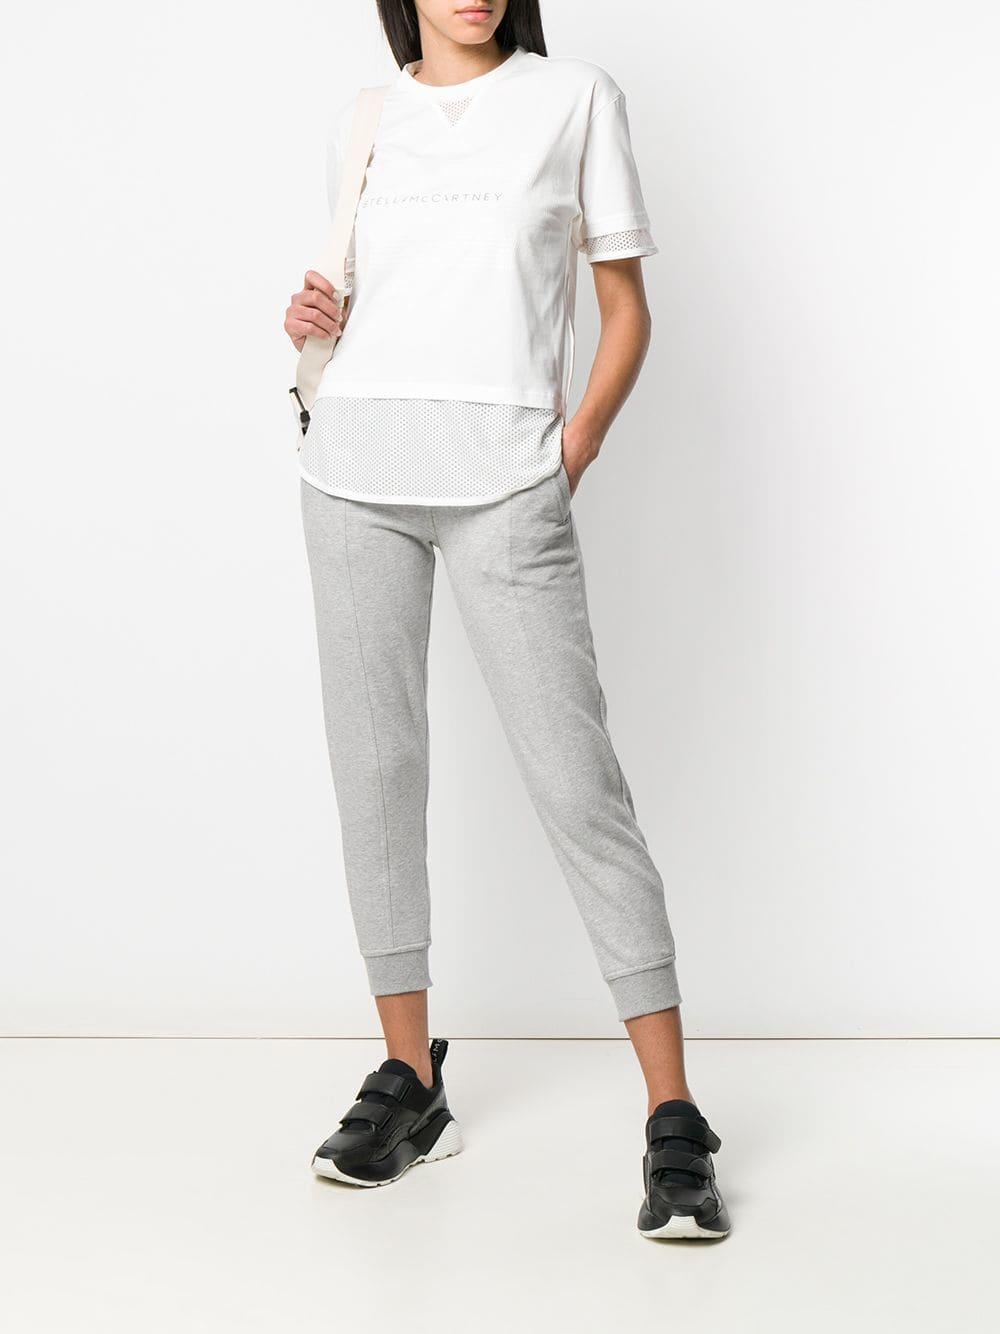 6217592f2 Lyst - adidas By Stella McCartney High Waisted Sweatpants in Gray